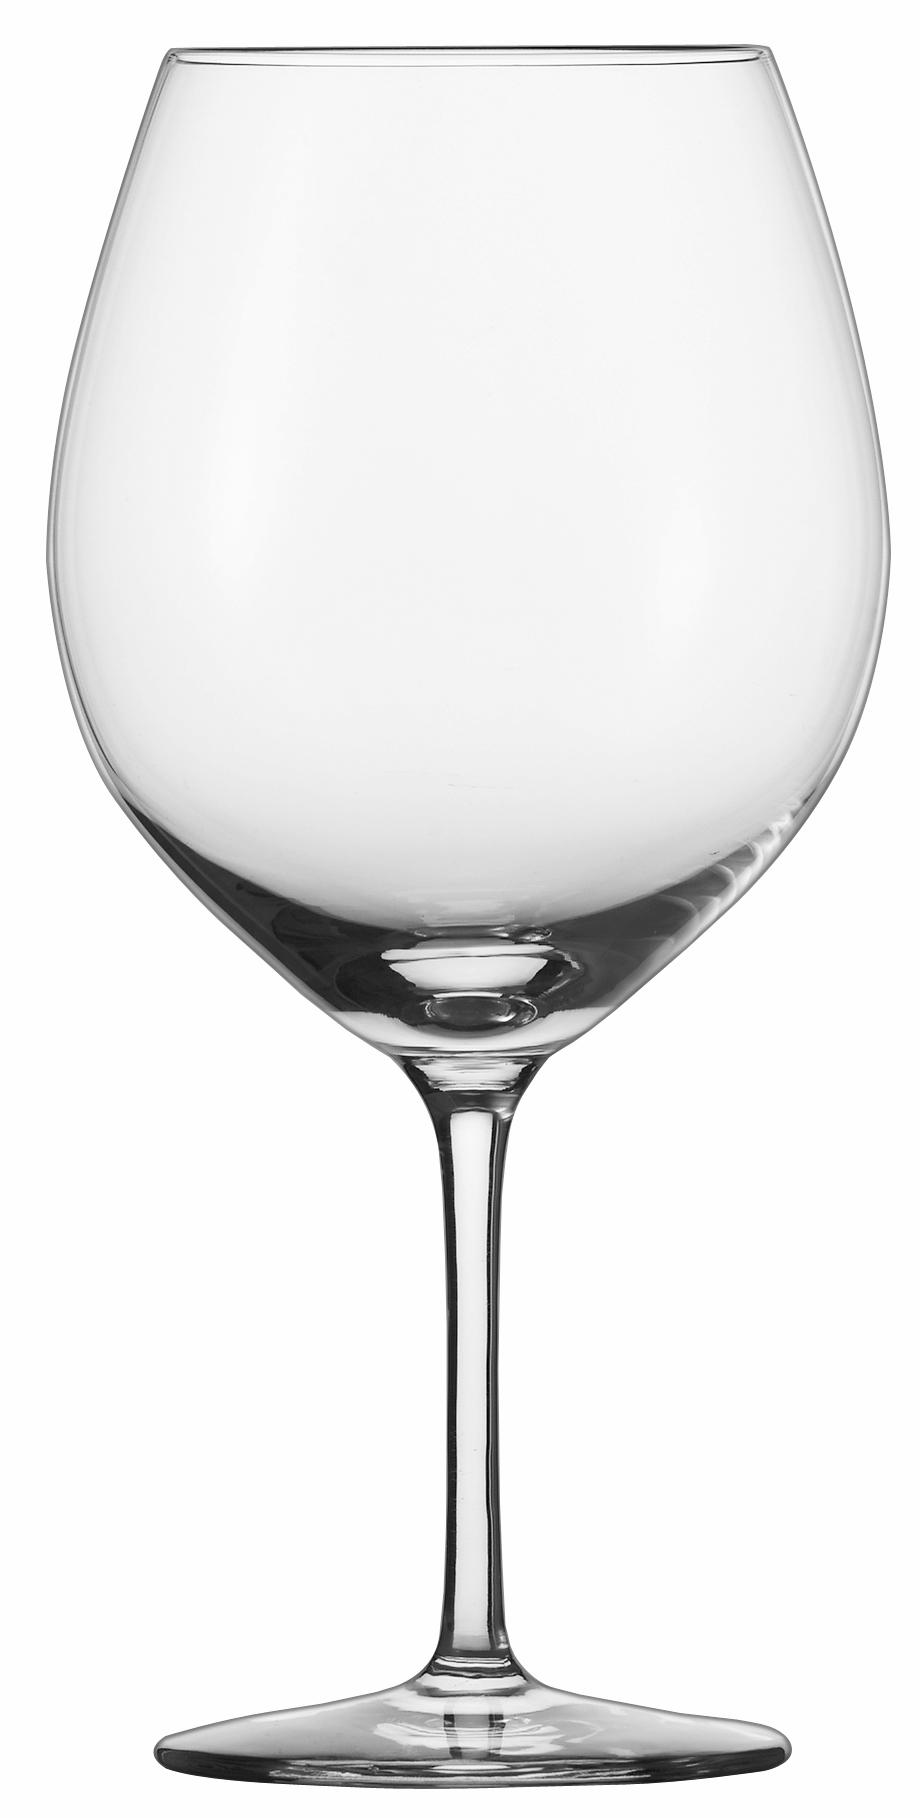 Bourgogne - Cru Classic